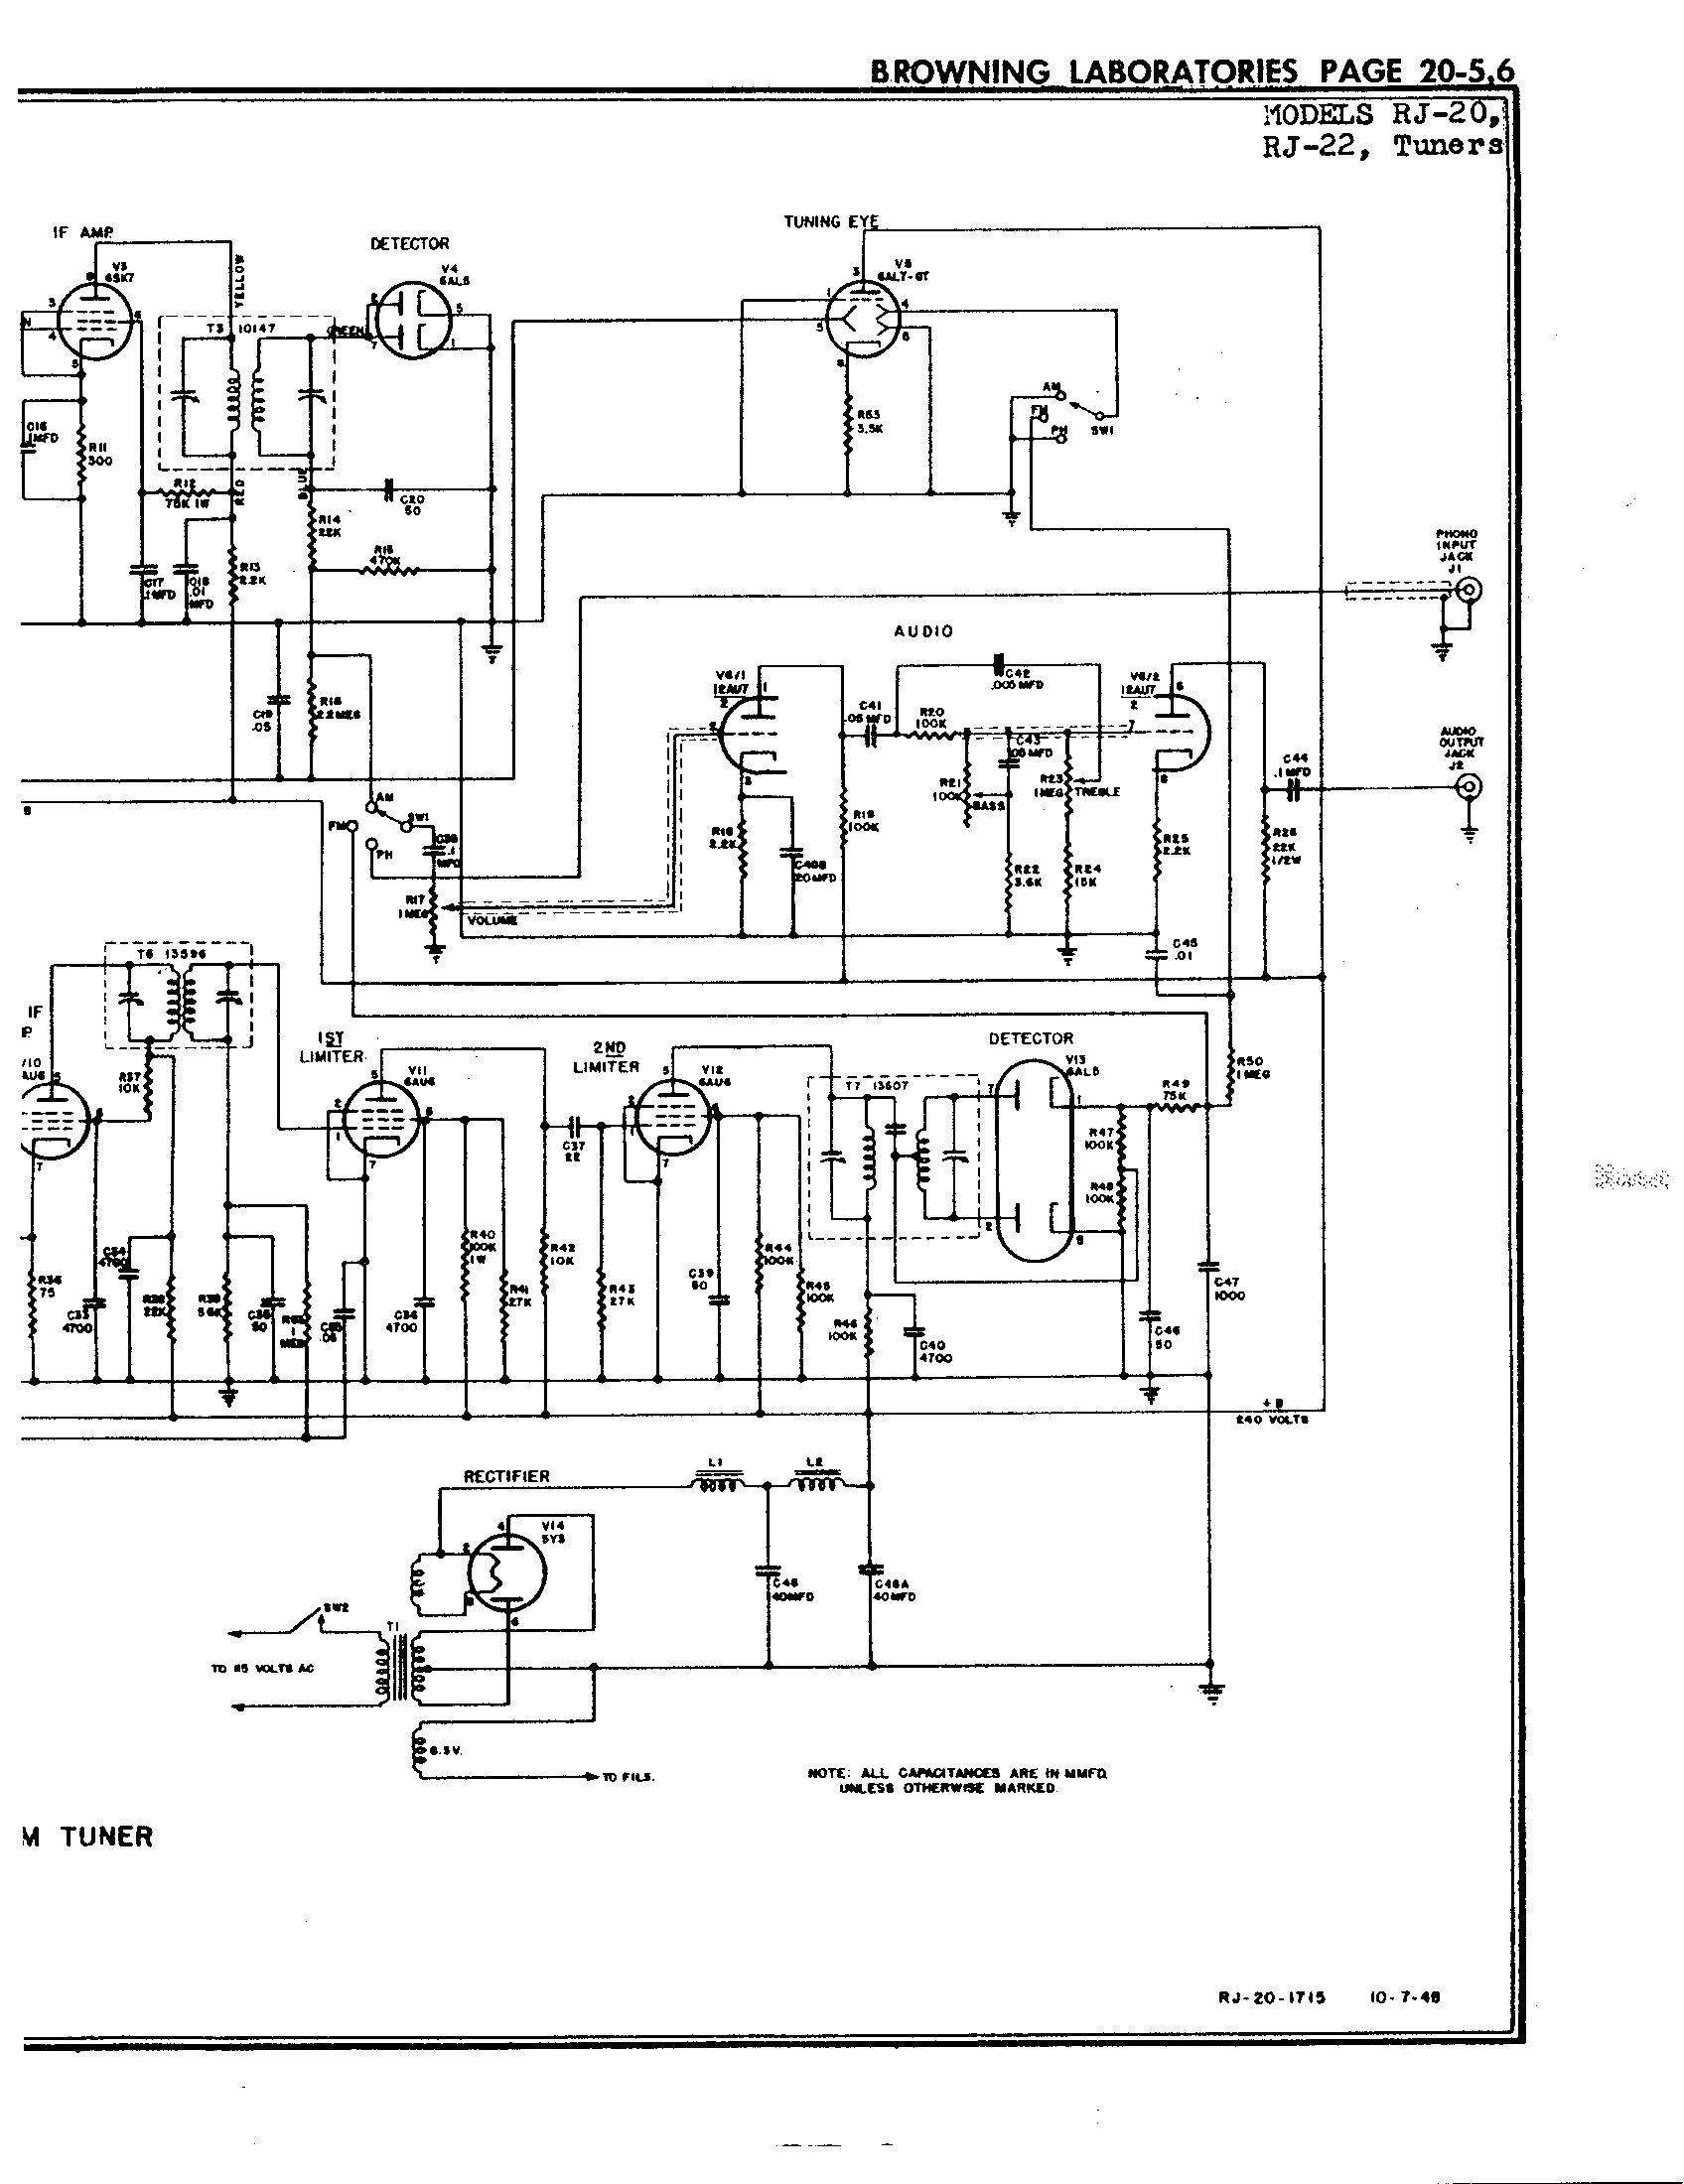 Browning Laboratories Inc Rj 20